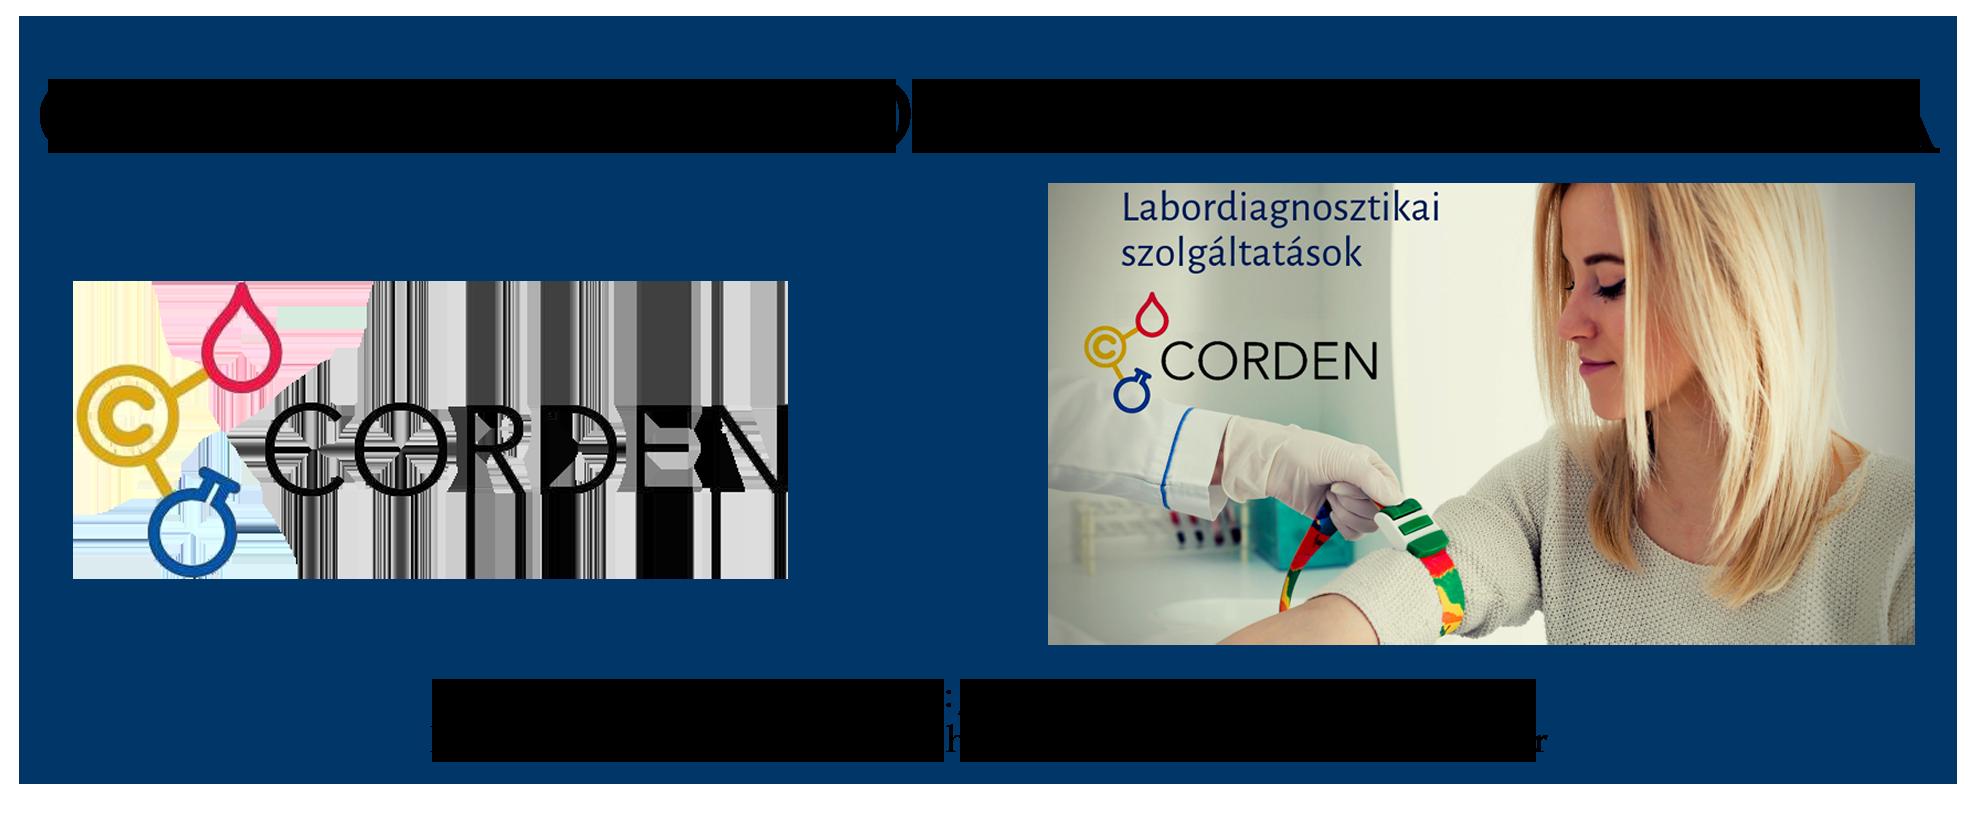 croden_labor